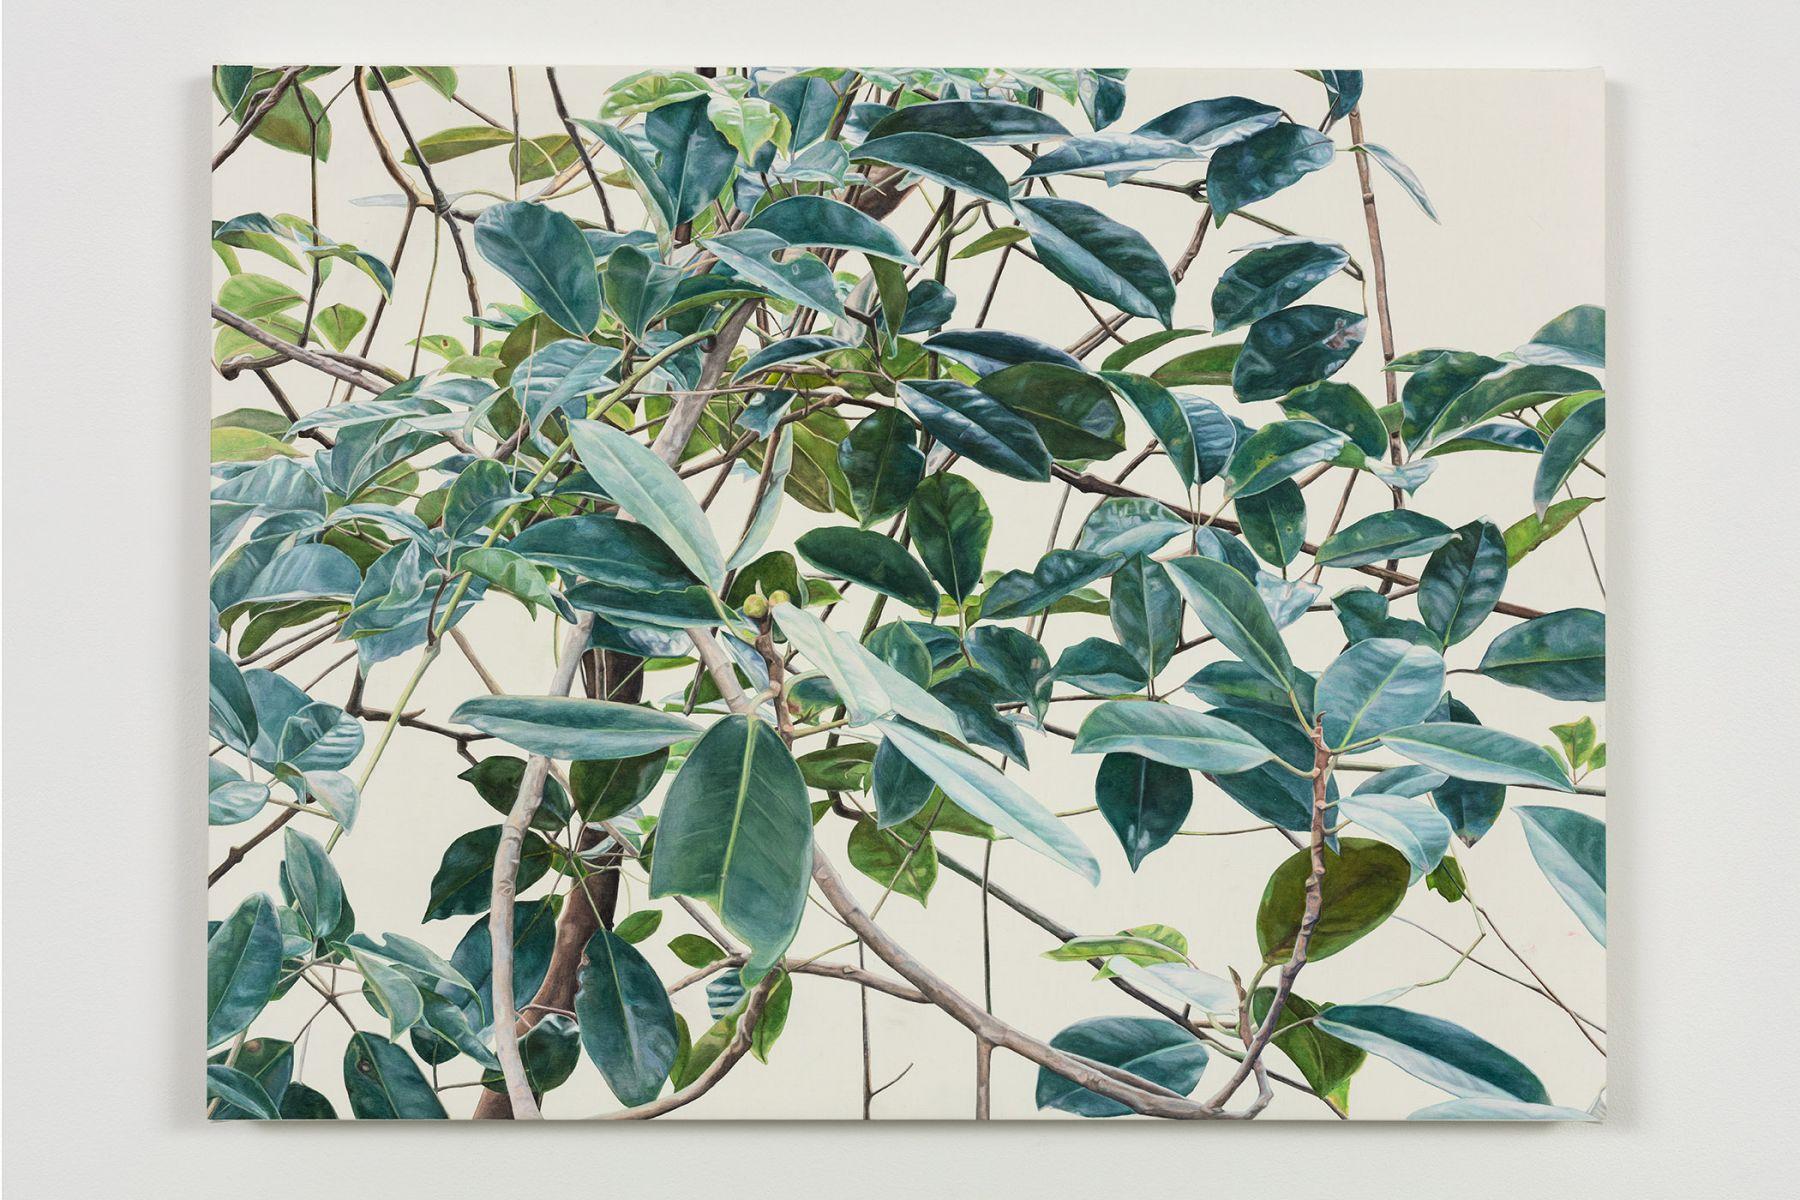 Toba Khedoori - leaves/branches